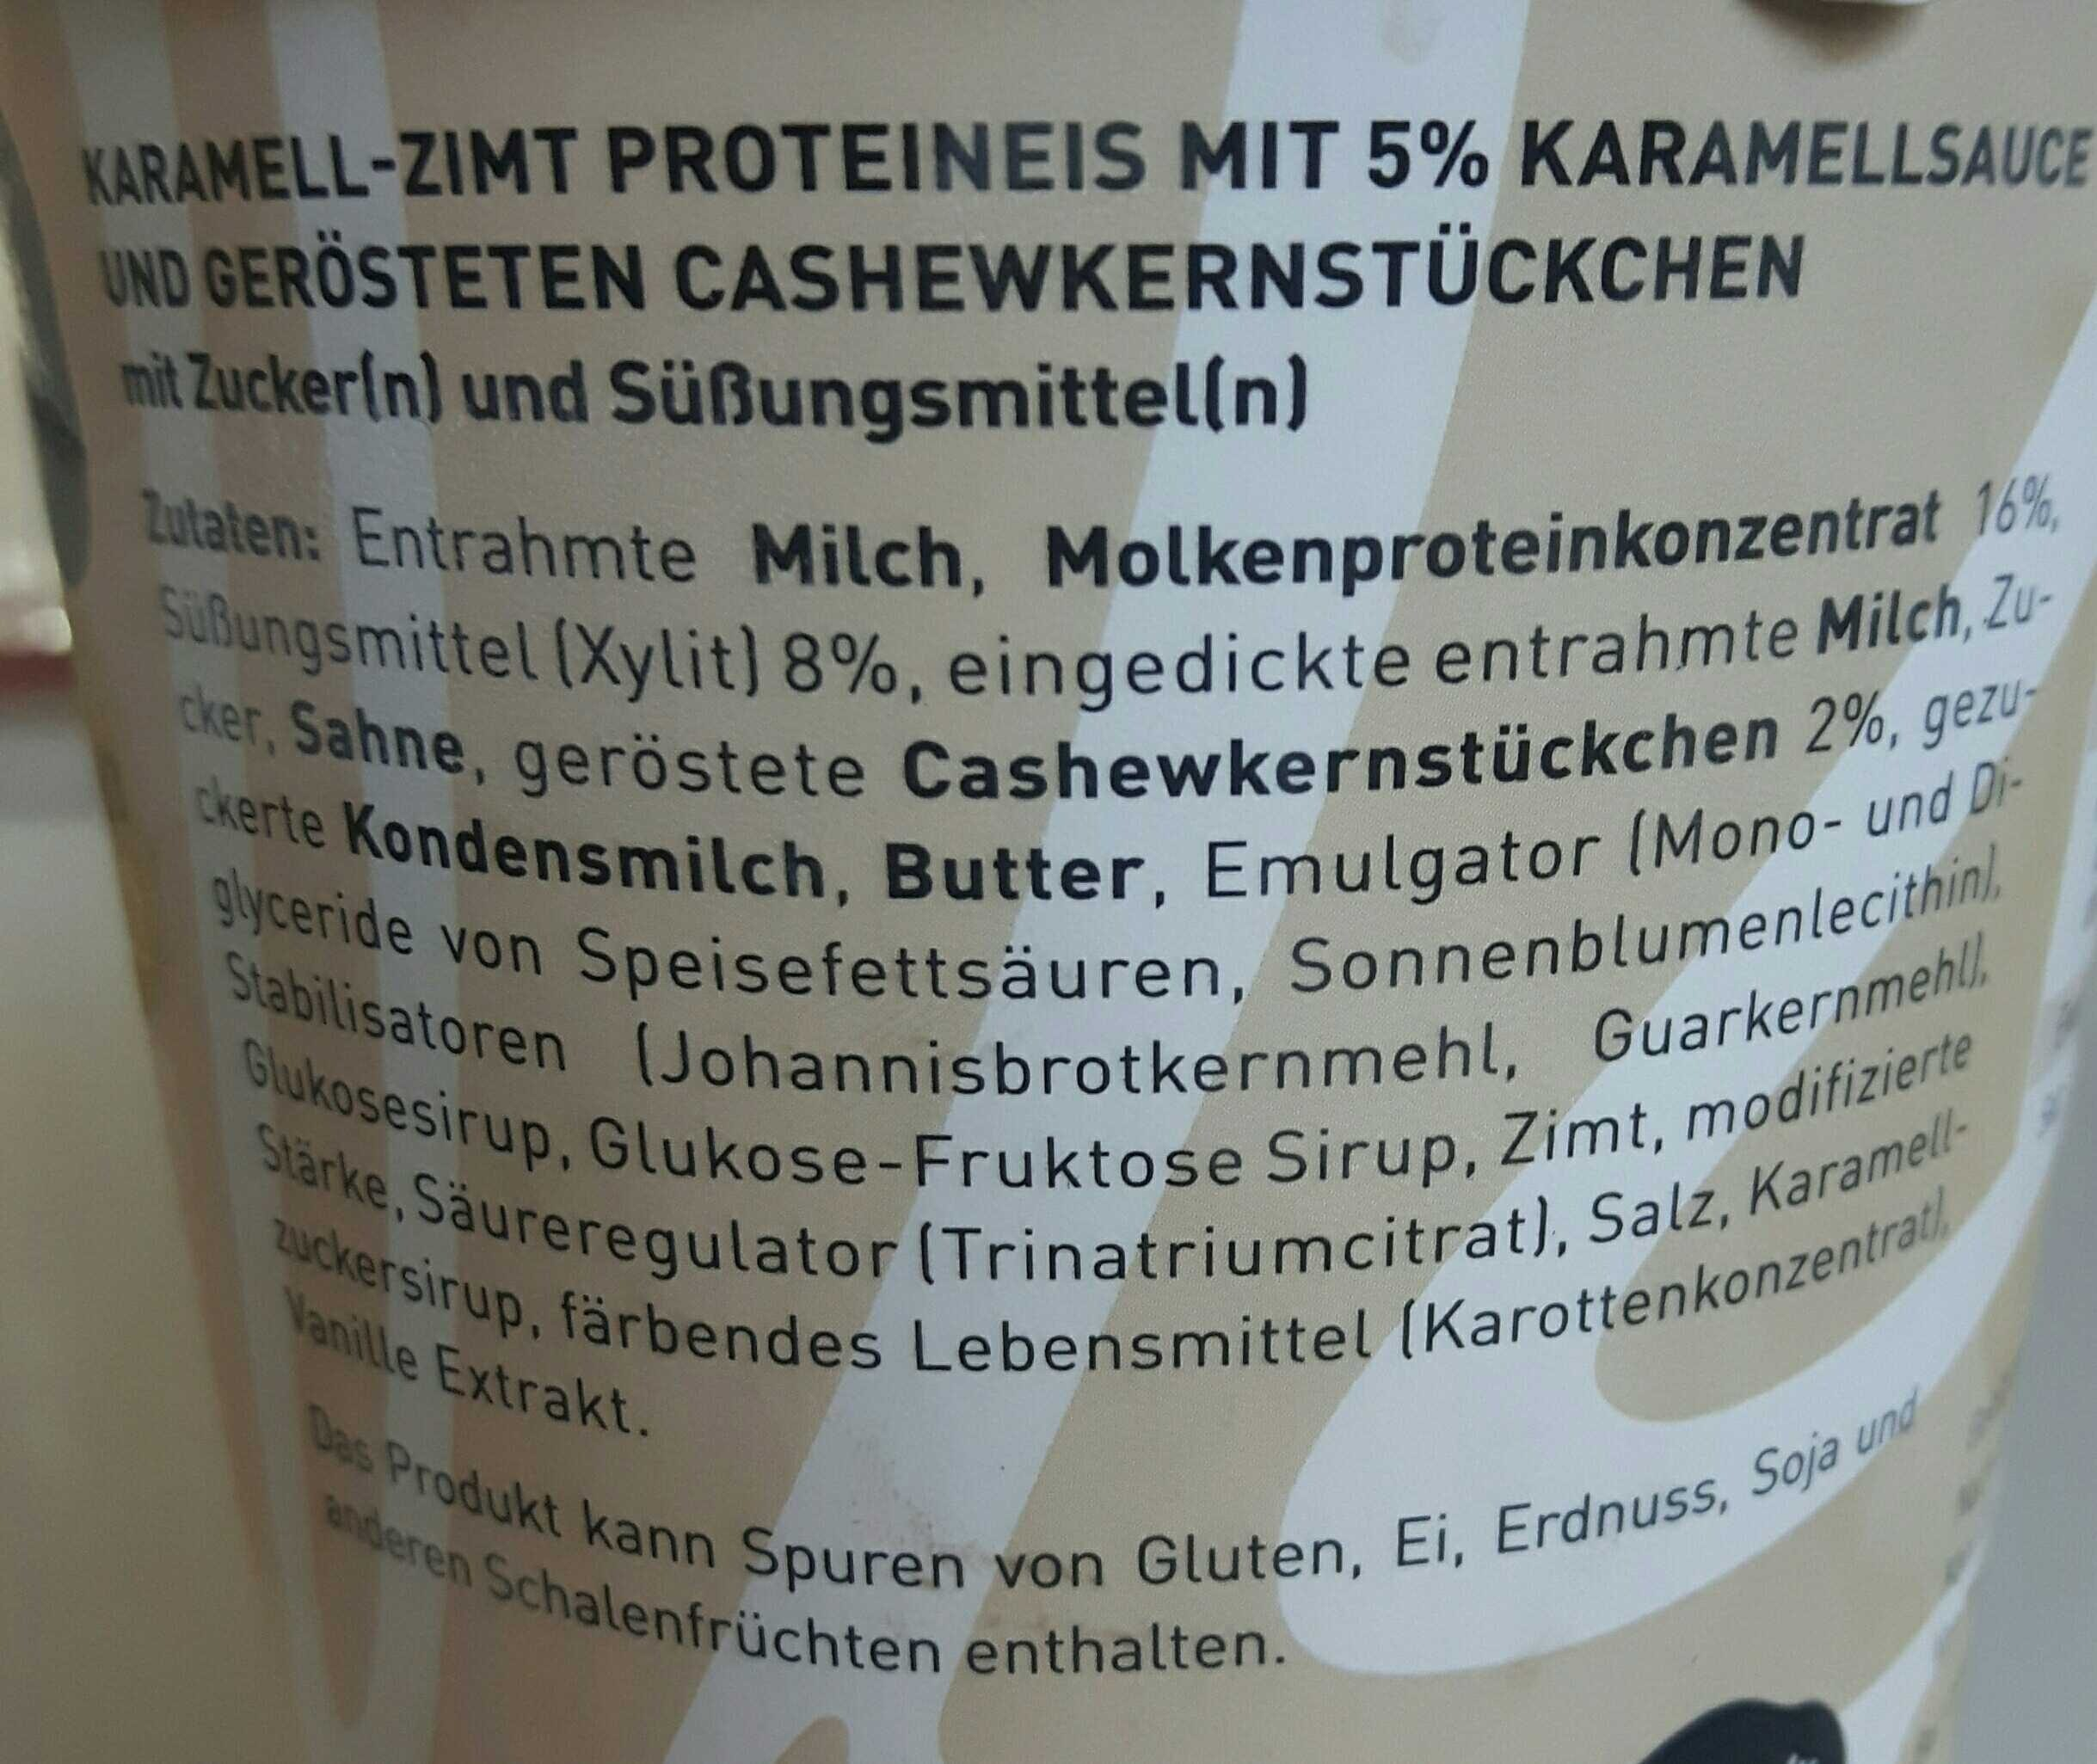 Pro Delight Lady Cinnamon 500 ml - Ingredients